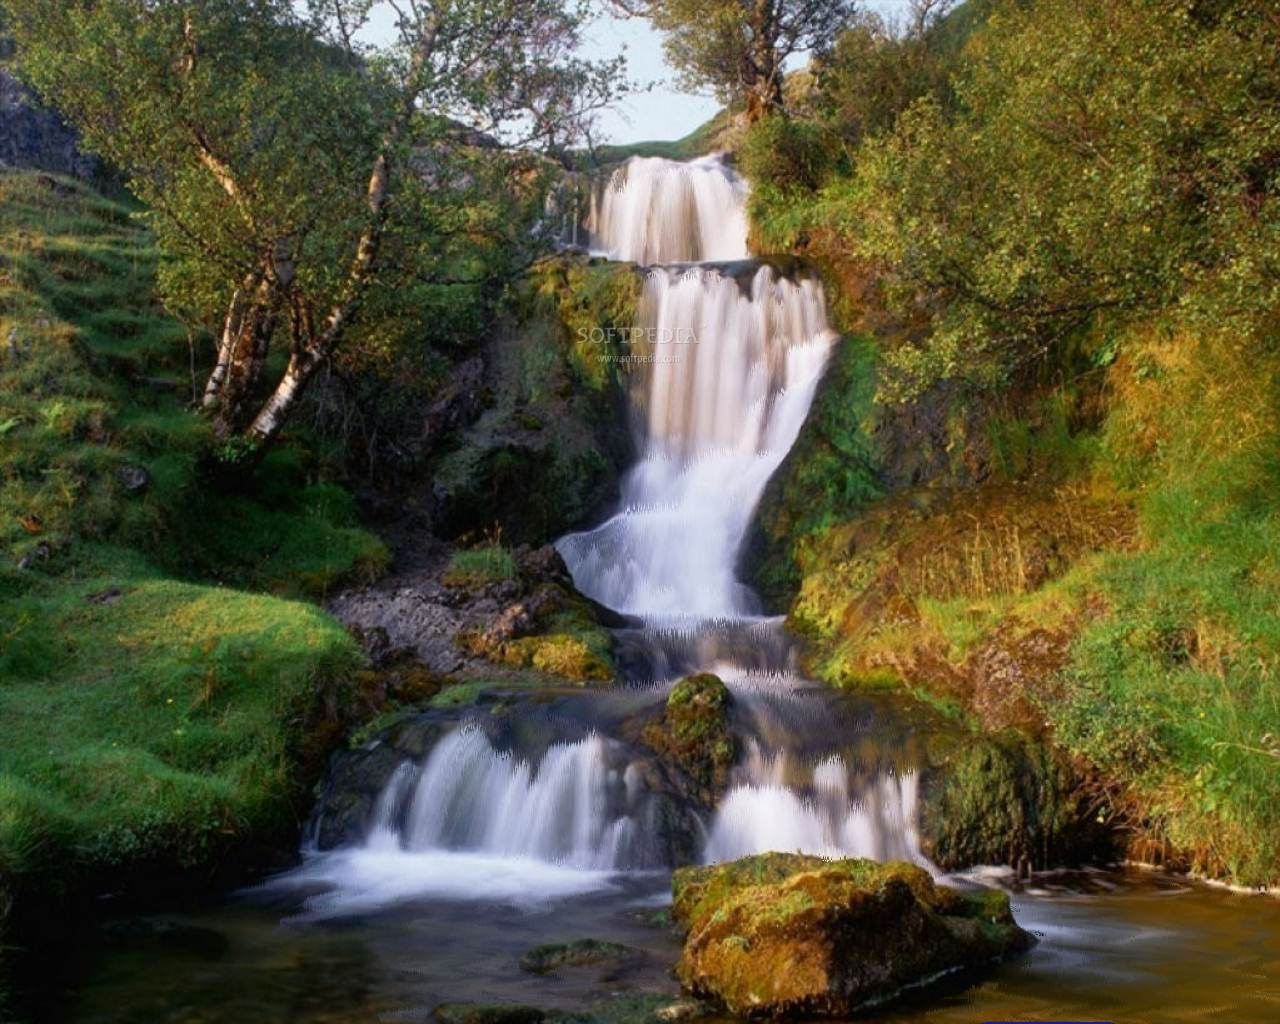 animated wallpaper waterfall screensaver 1280x1024